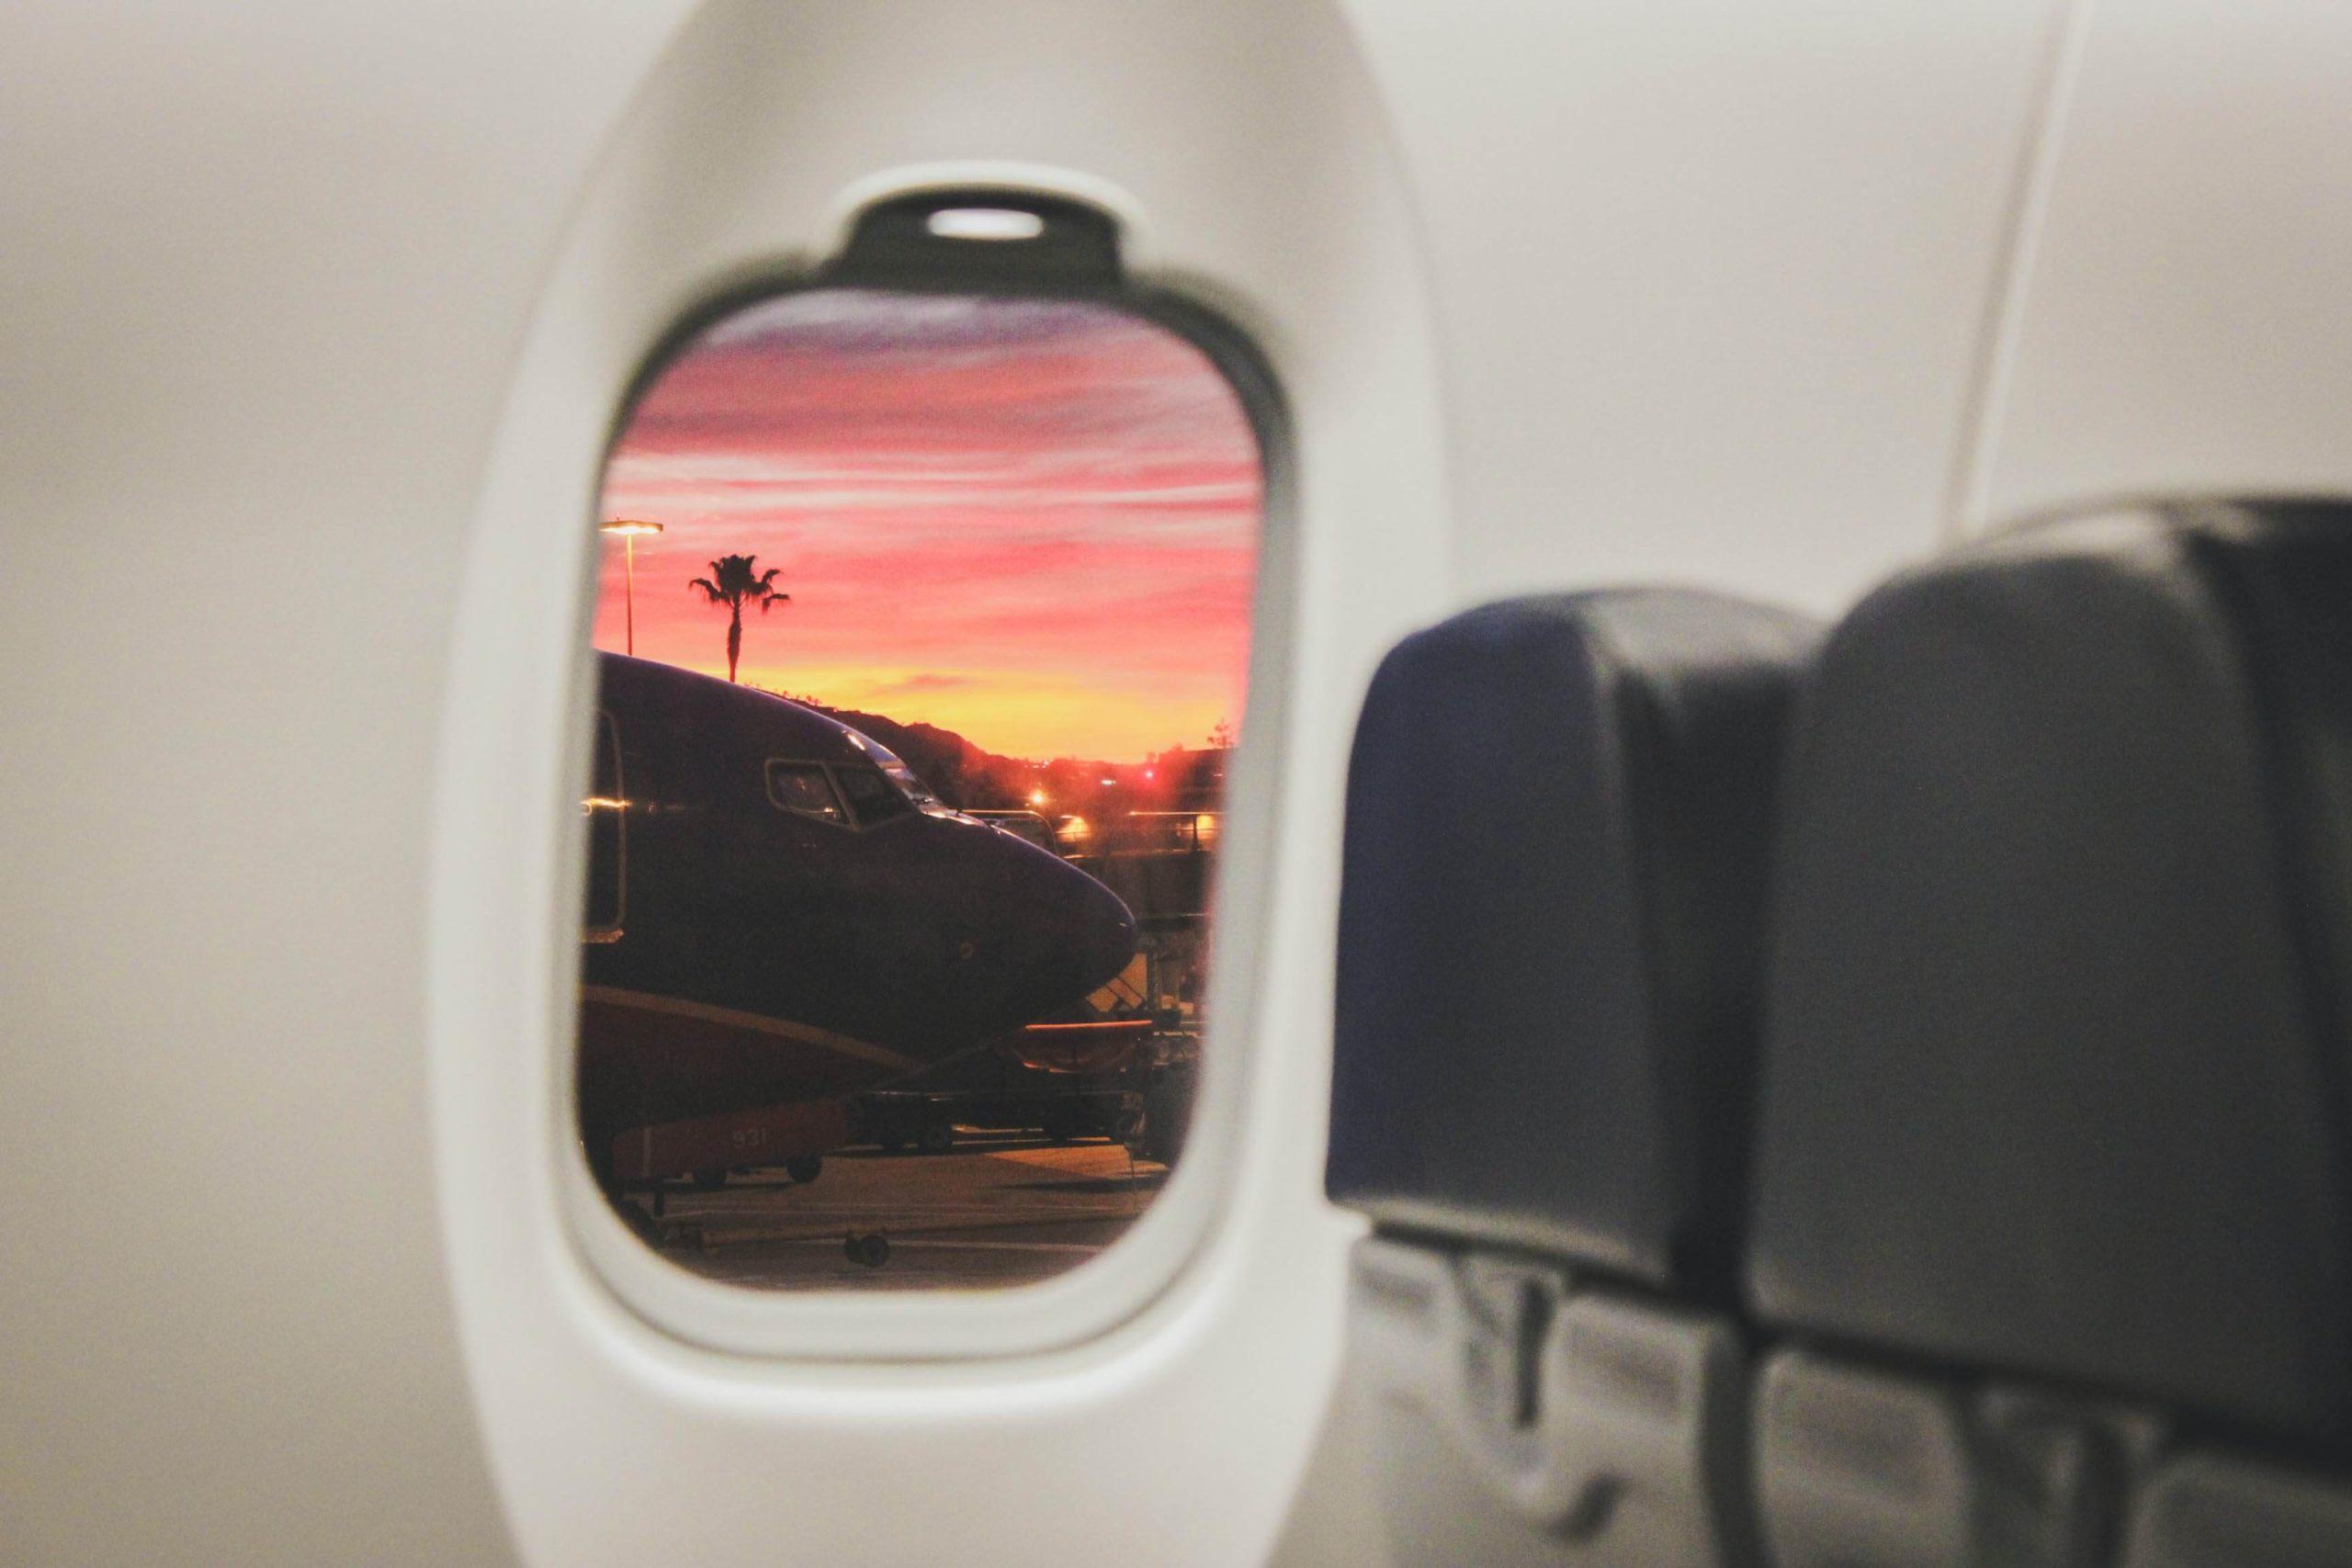 Image of an air plane window